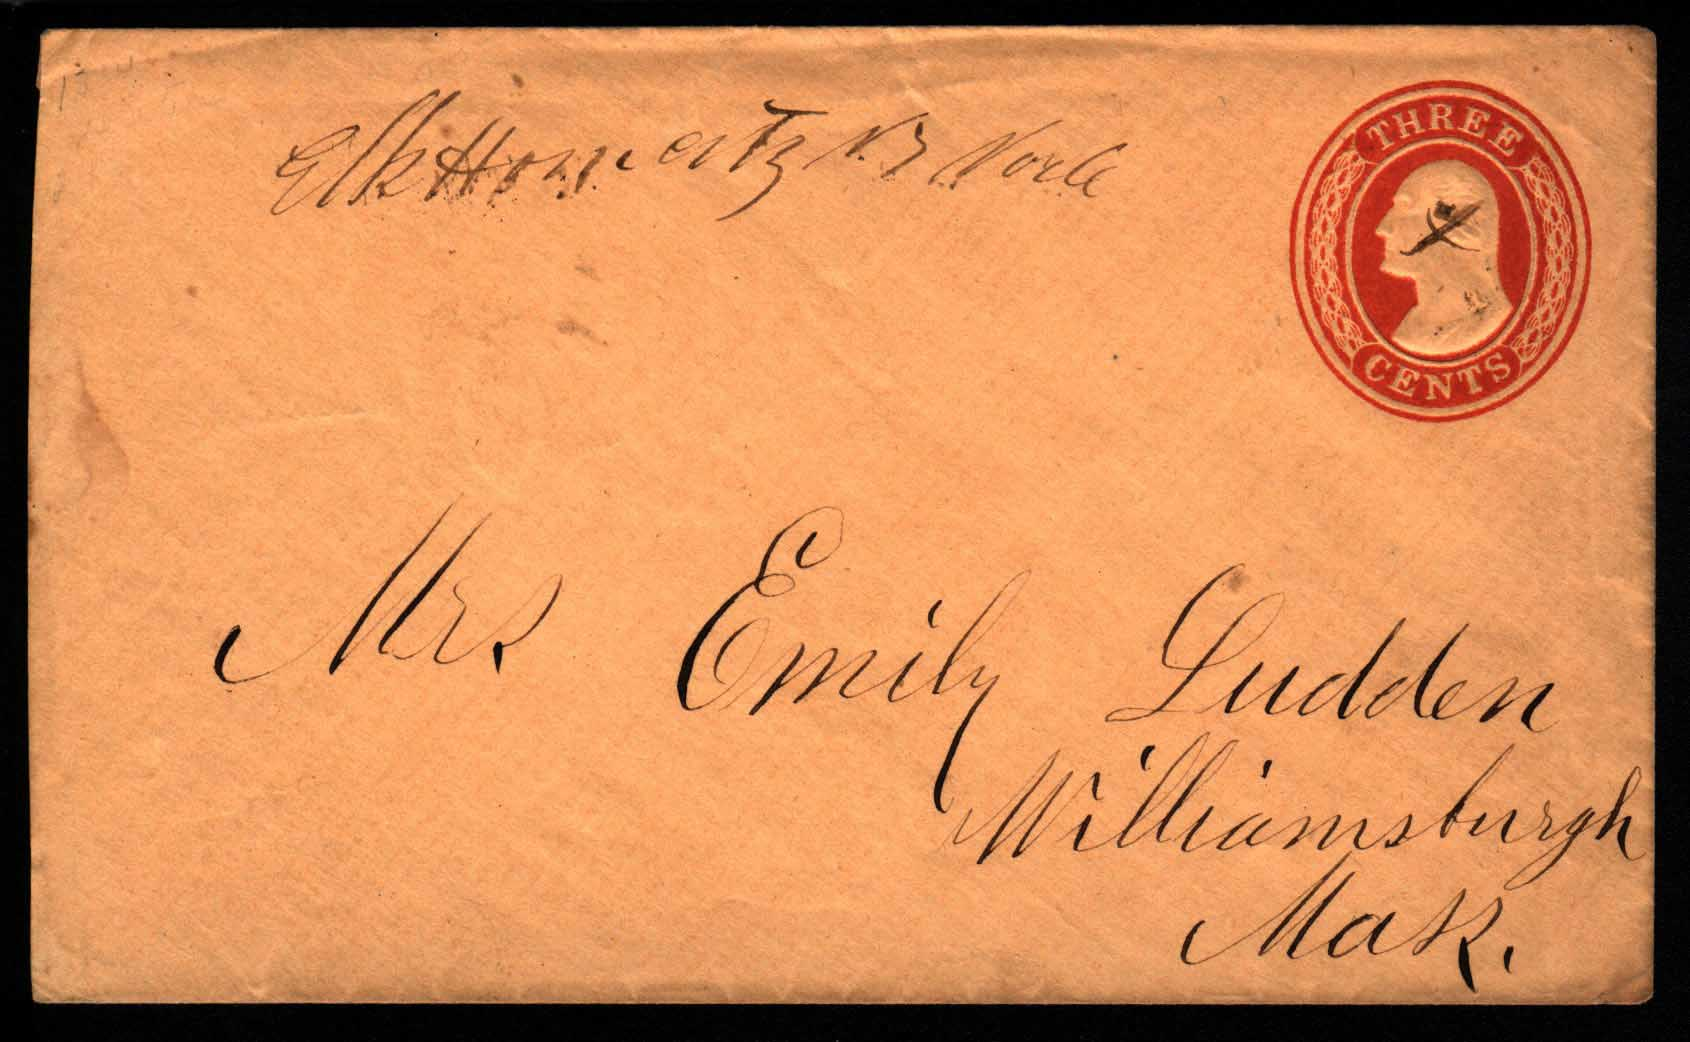 ElkHornCity 1857 11 06